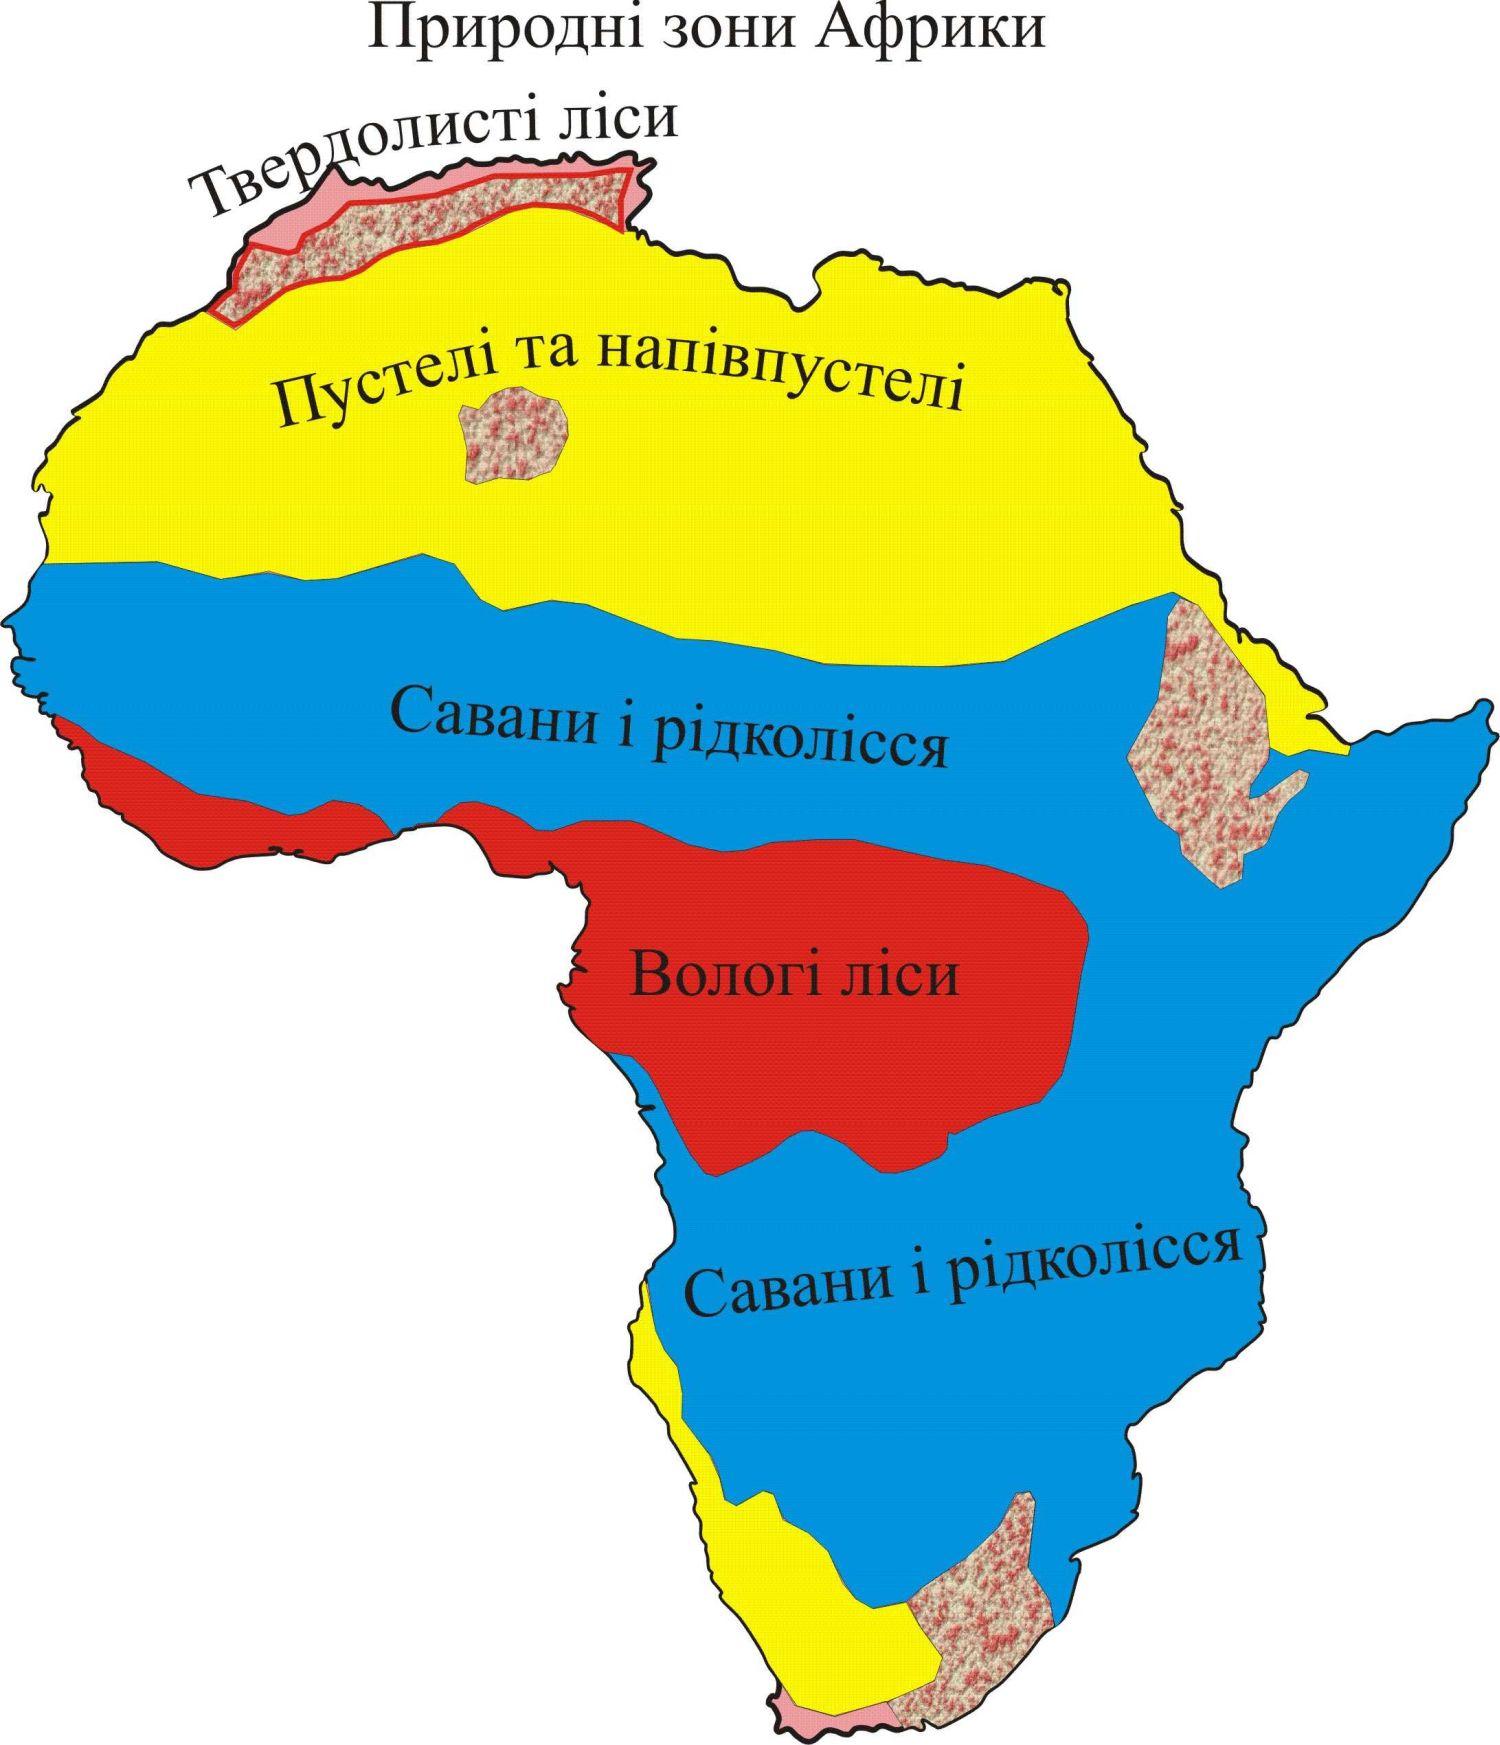 Природні зони Африки - карта